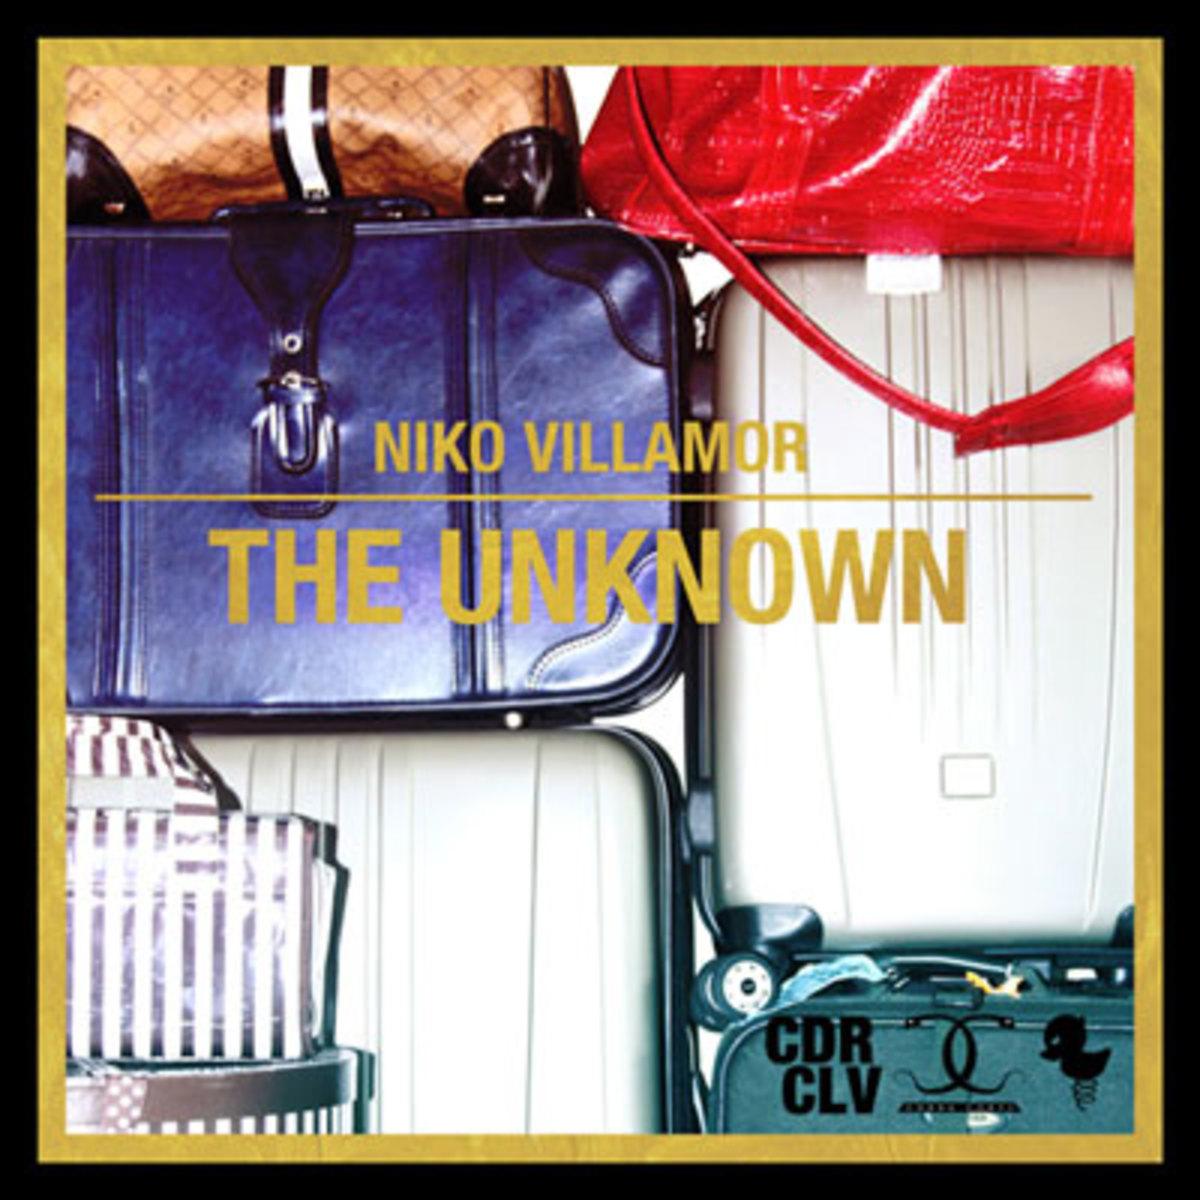 nikovillamor-theunknown.jpg